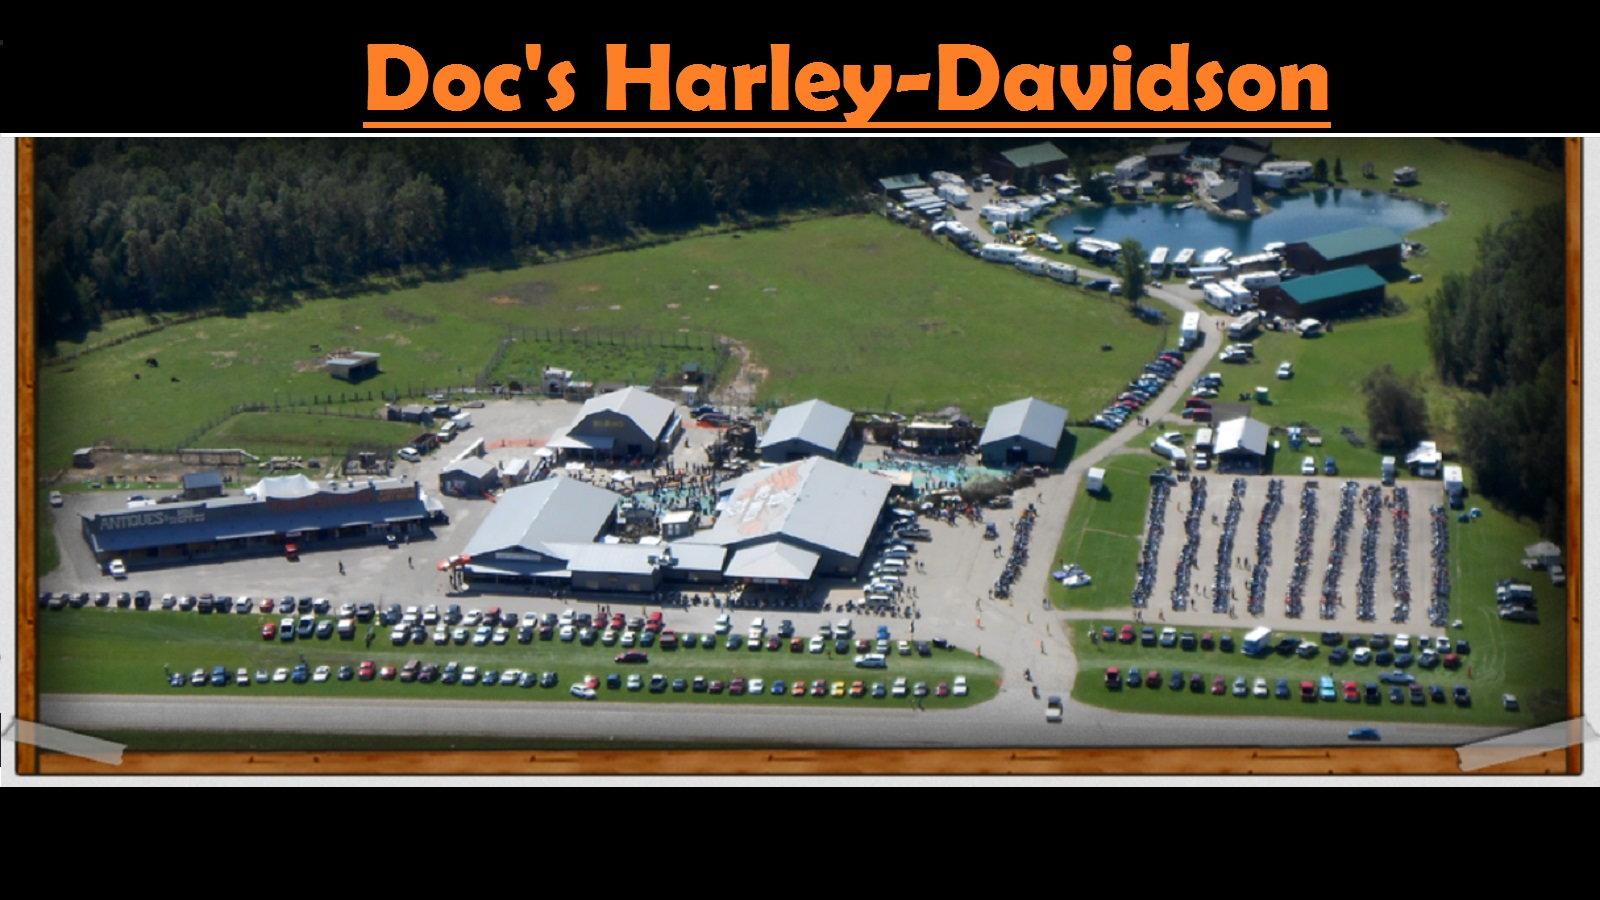 8 more harley dealerships you have to visit before you die - hdforums